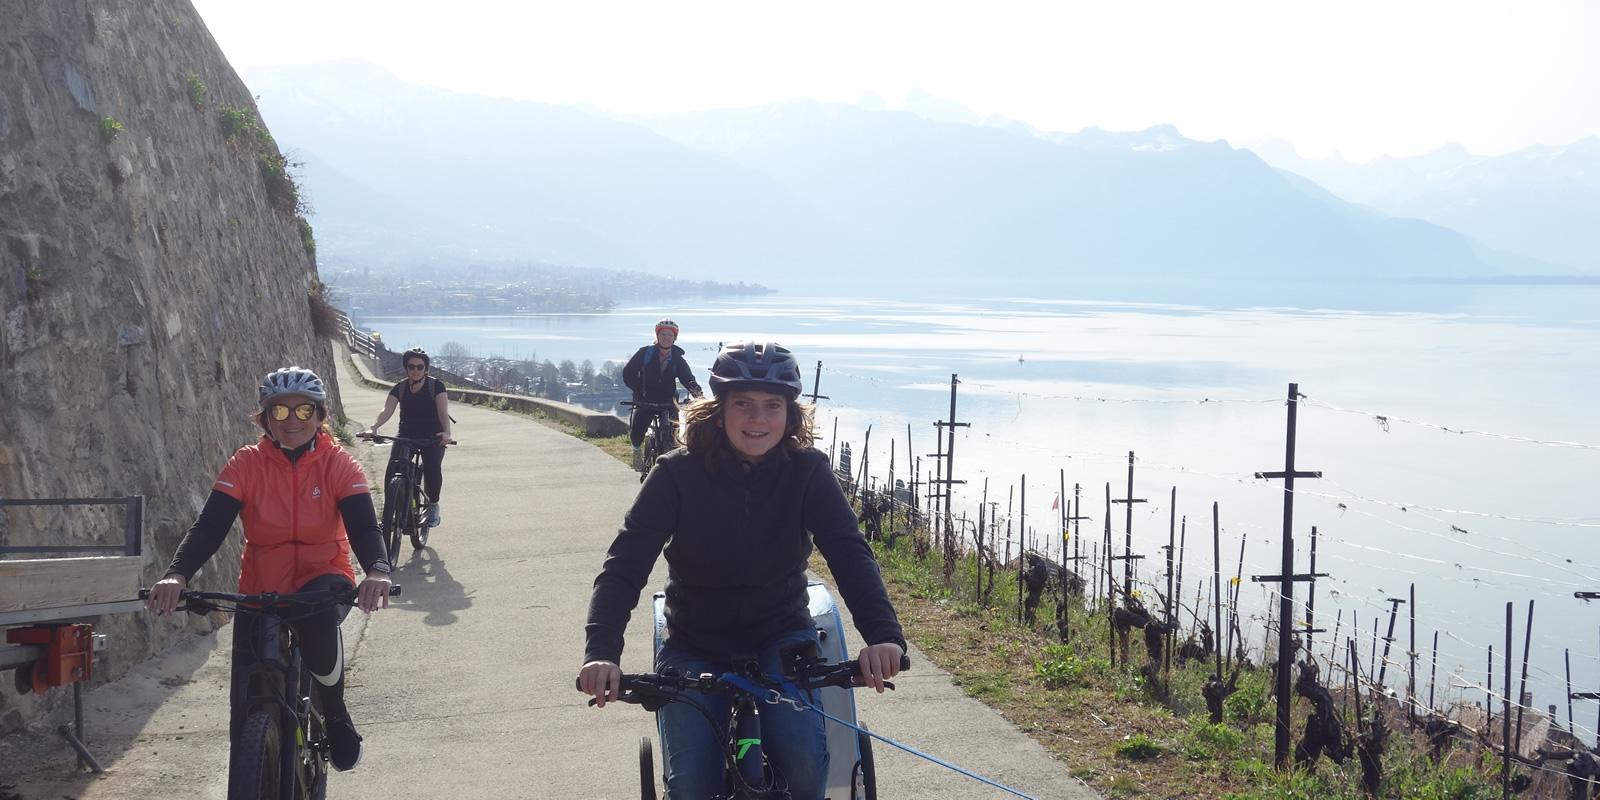 BIKAPA Rando VTT Remise en selle initiation e-bike